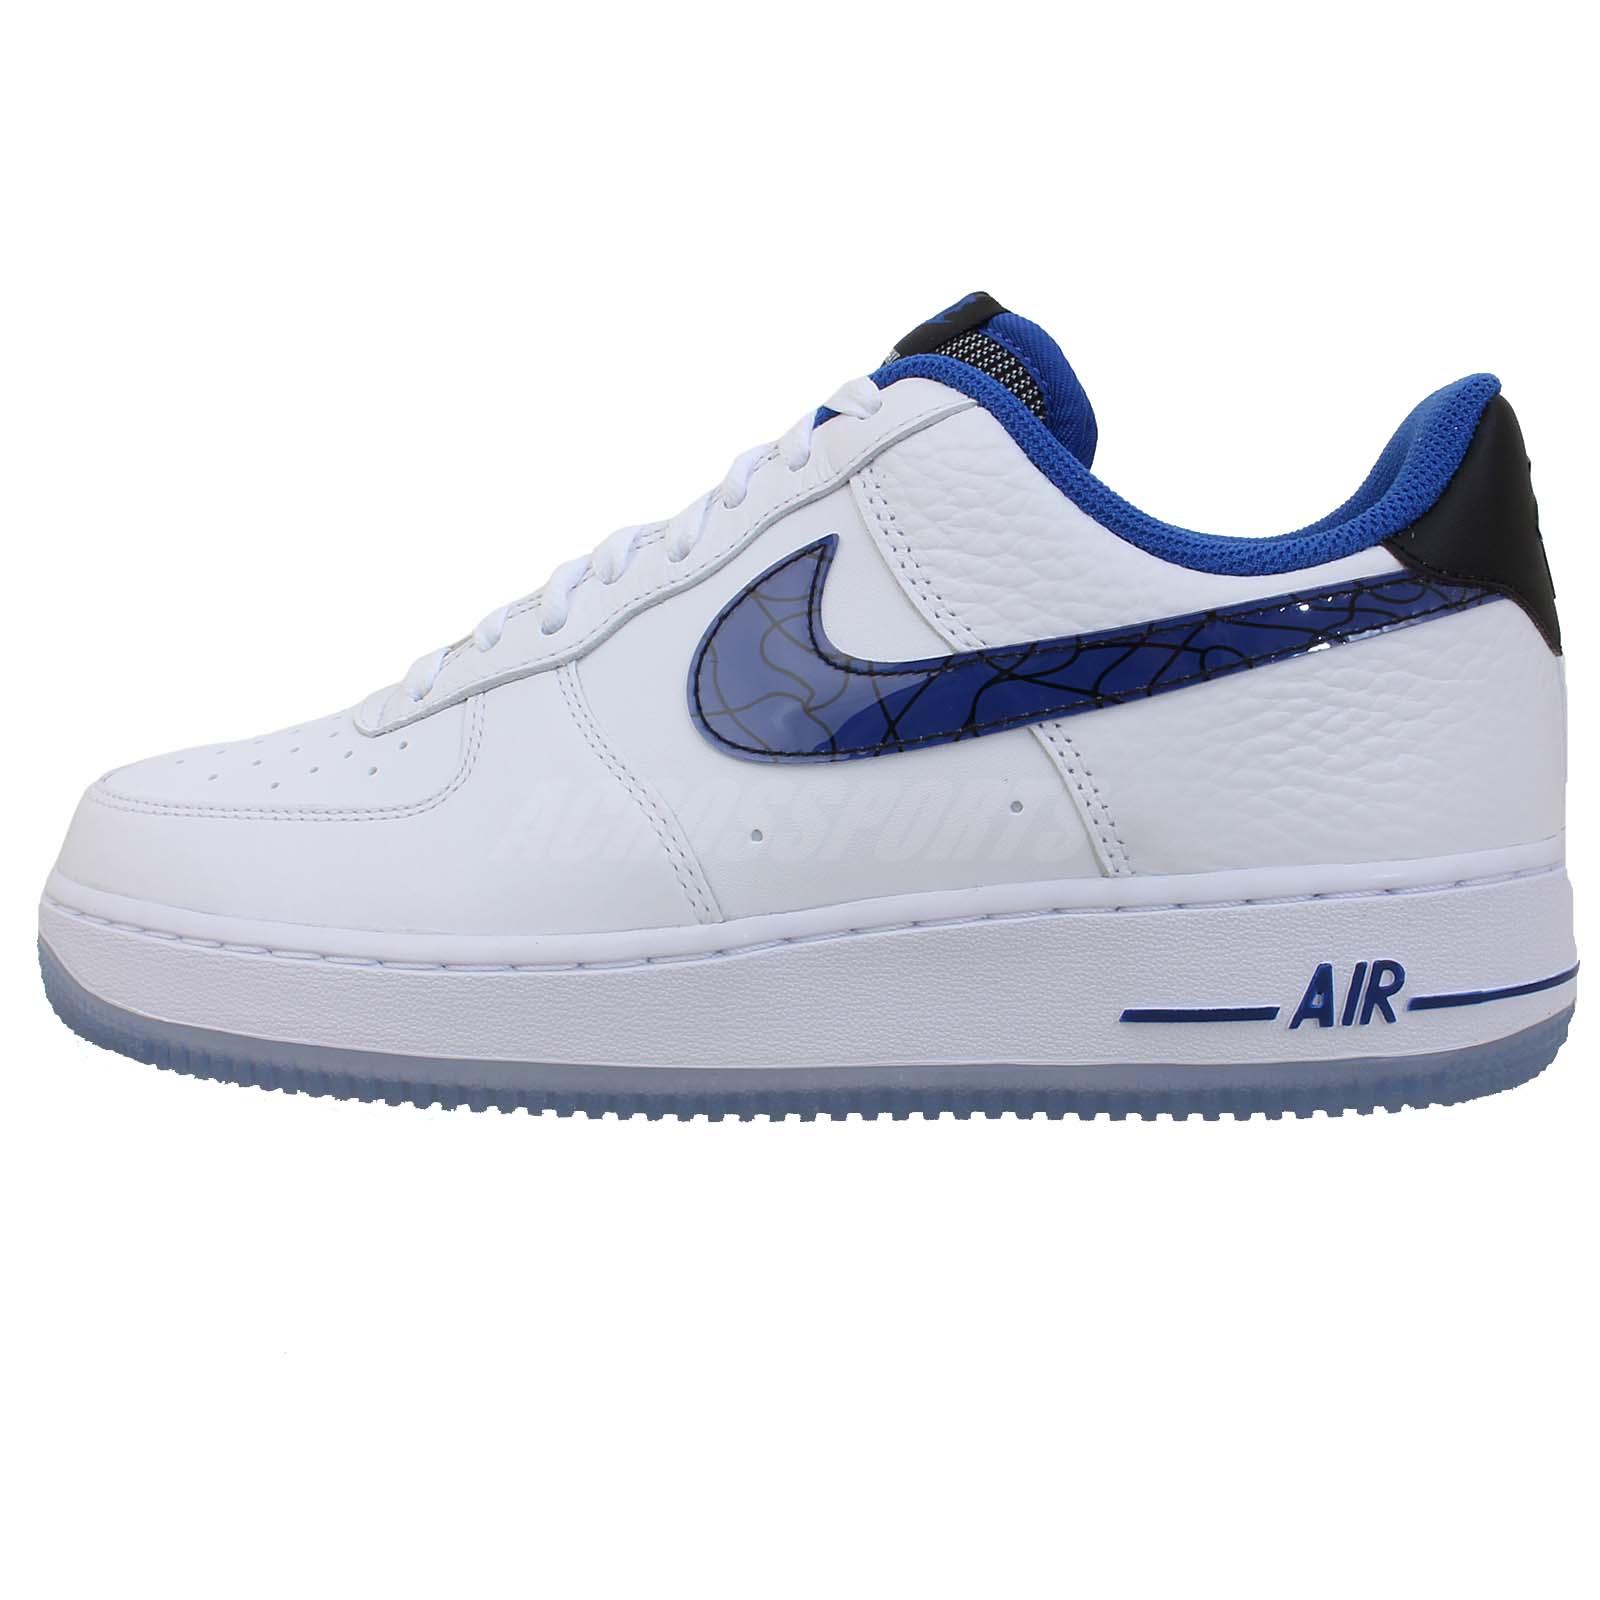 Nike Air Force 1 07 Penny Hardaway Orlando Magic 1 Blue ...